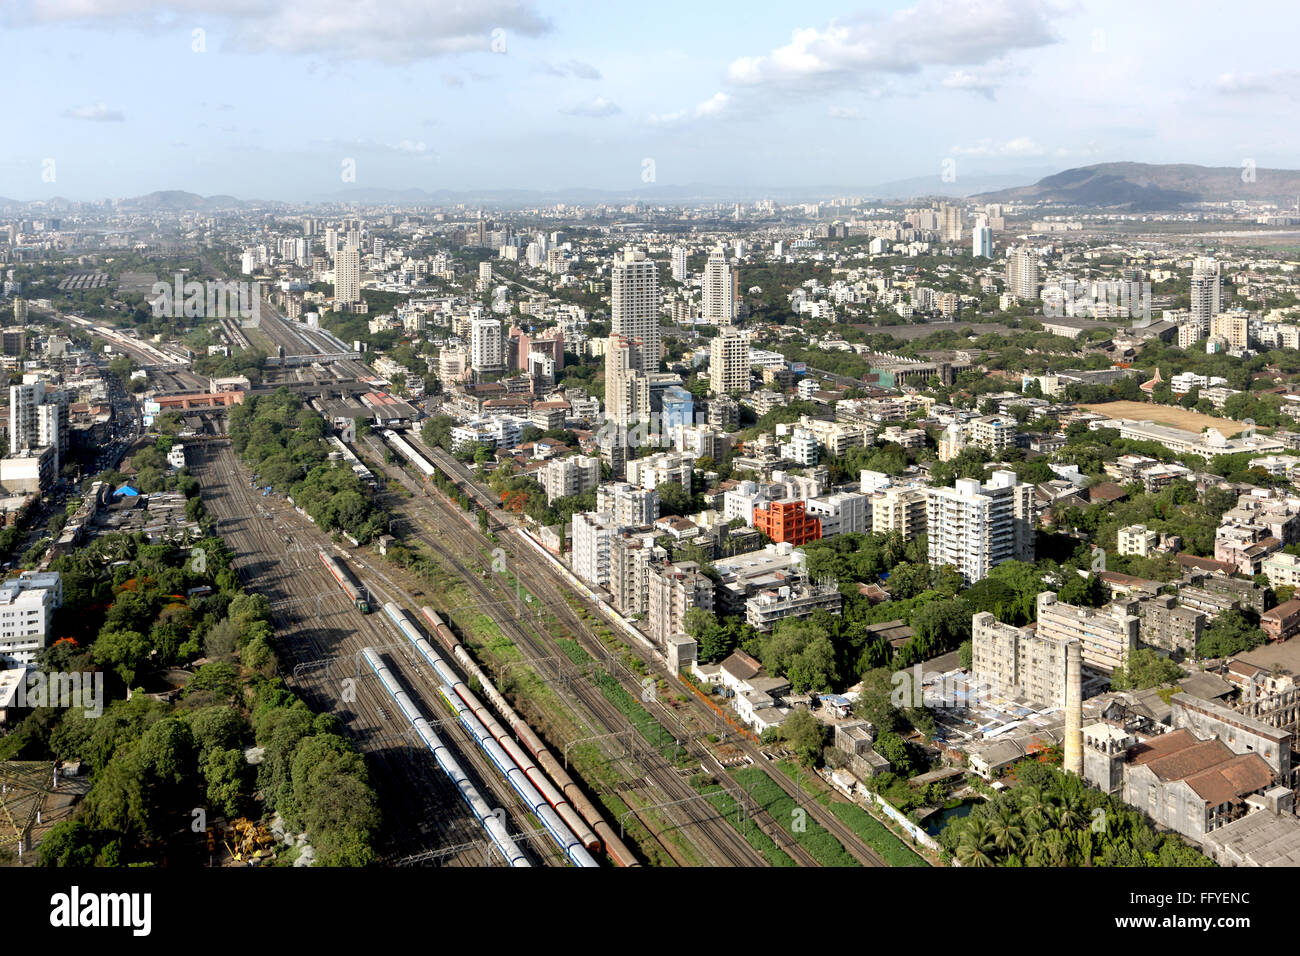 Aerial view of dadar and matunga with railway lines ; Bombay Mumbai ; Maharashtra ; India - Stock Image